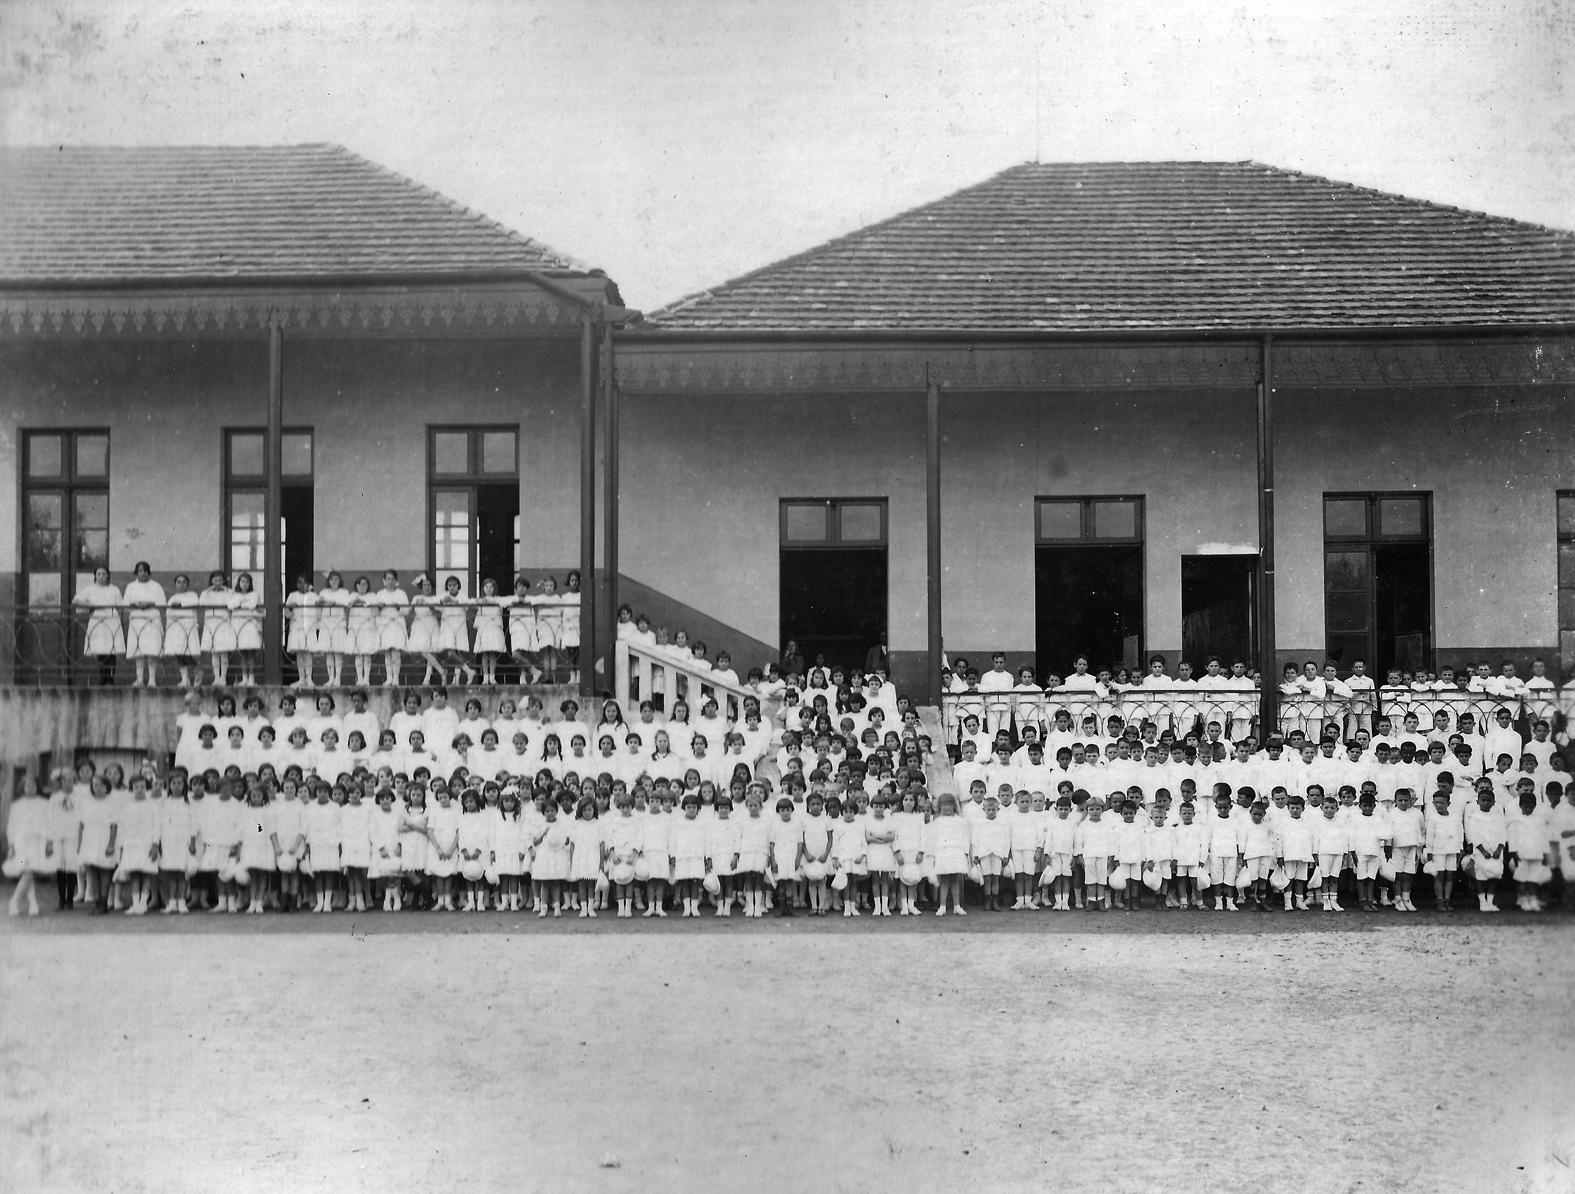 Alunos do Grupo Dr. Xavier da Silva no pátio da escola –década de 1920.